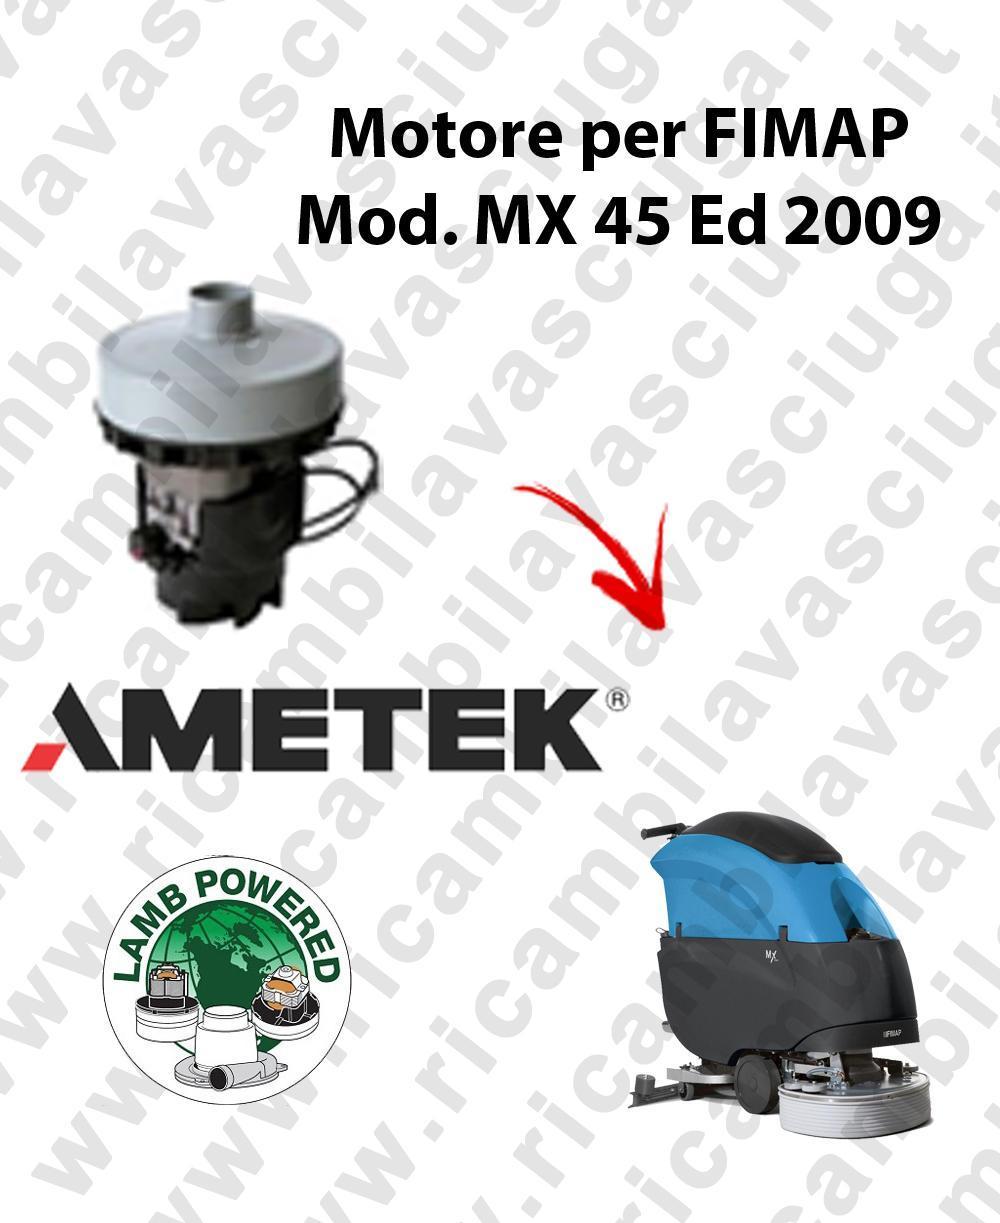 MX 45 Ed. 2009 Saugmotor LAMB AMETEK für scheuersaugmaschinen FIMAP